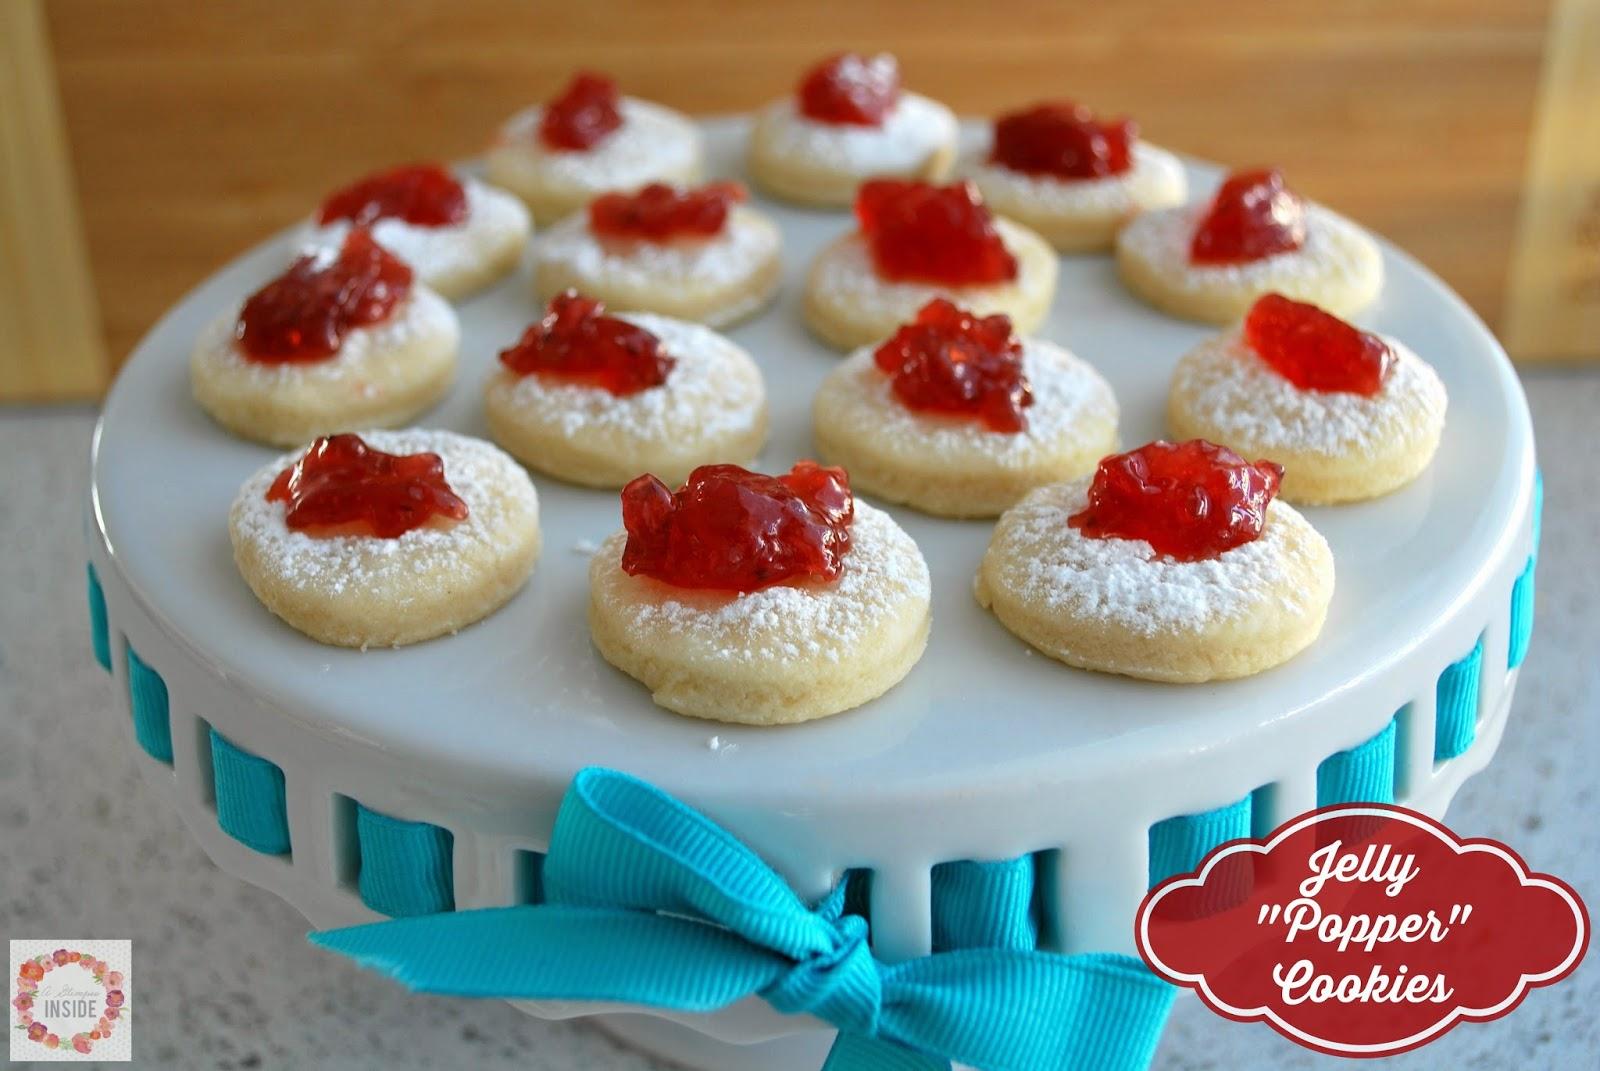 http://www.aglimpseinsideblog.com/2014/12/jelly-popper-cookies.html